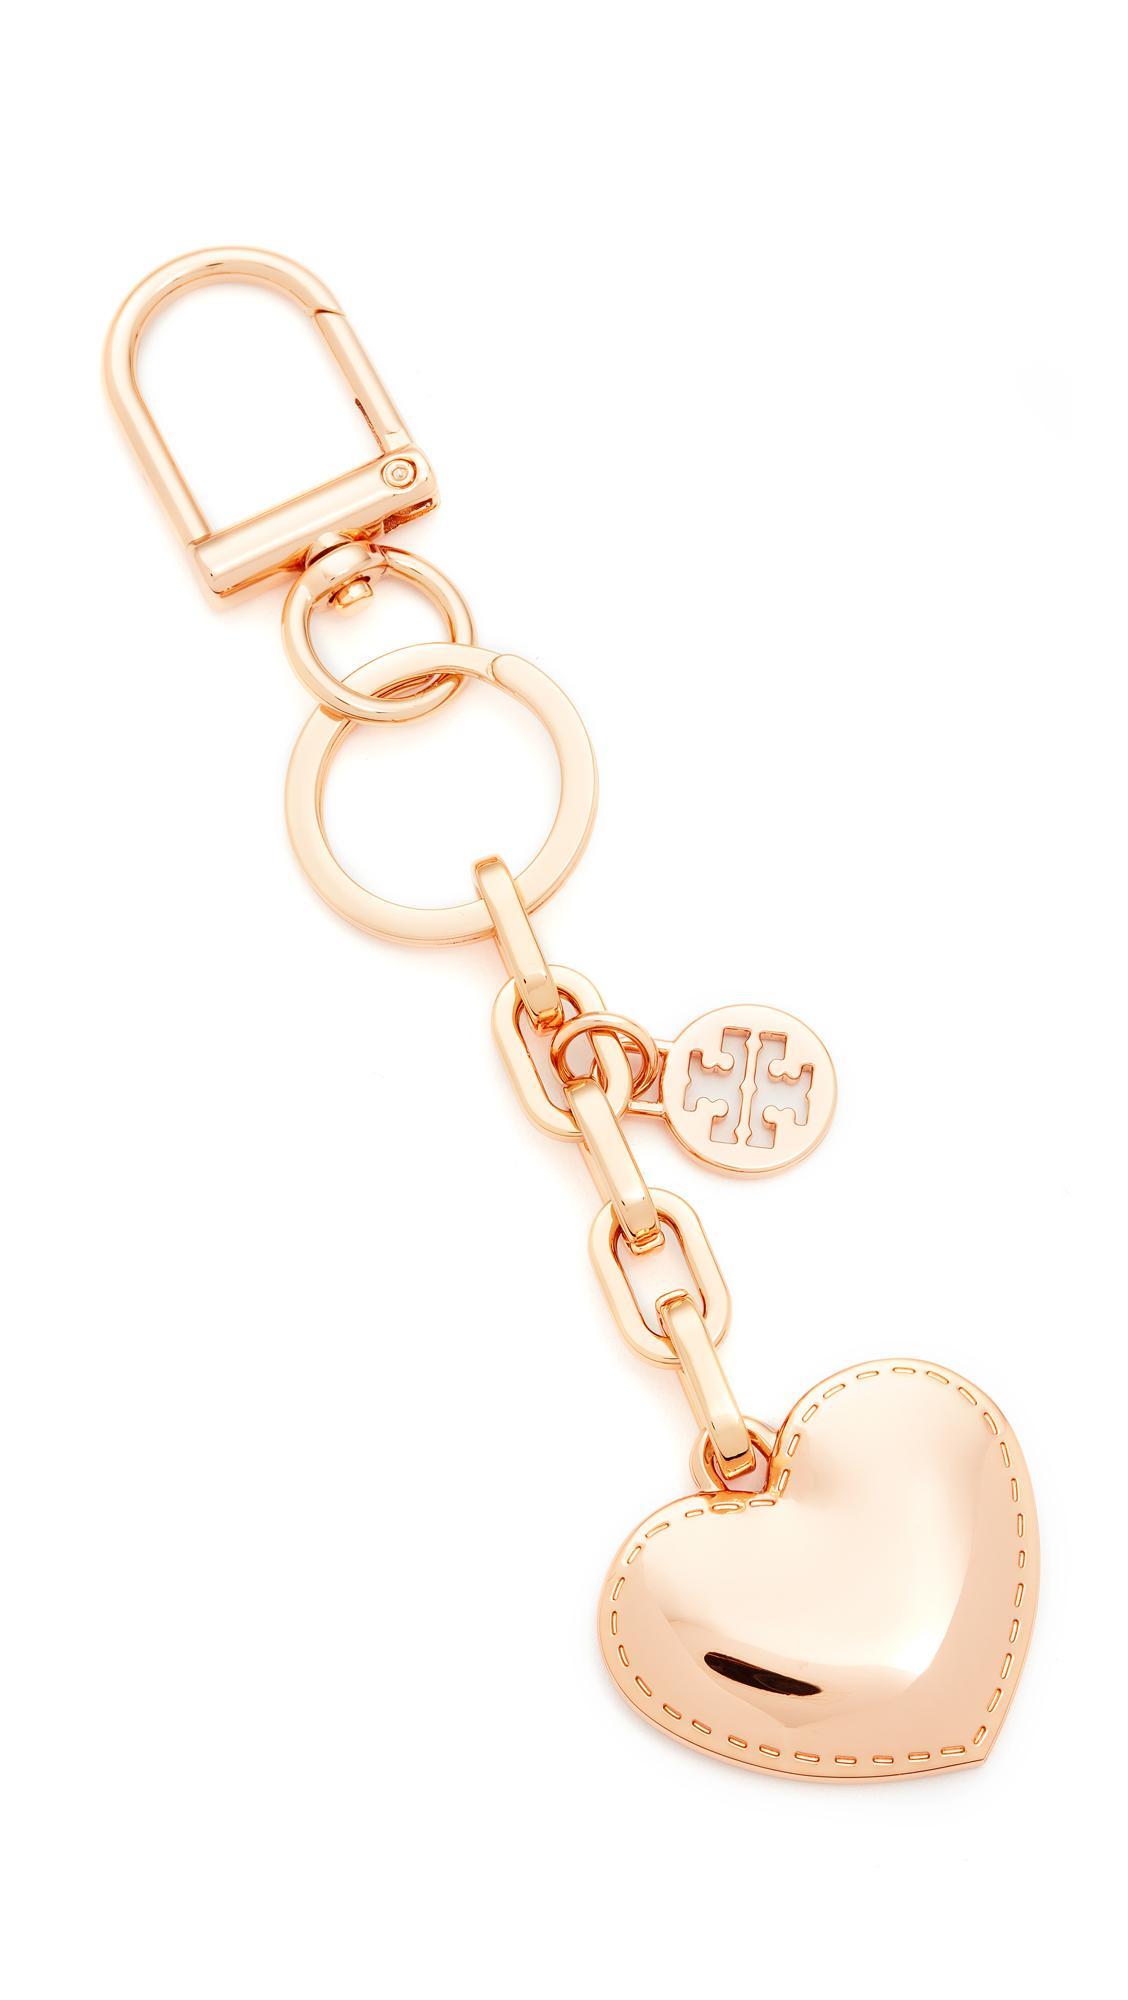 e2fd3b939f5e Lyst - Tory Burch Logo   Heart Metal Key Fob in Metallic